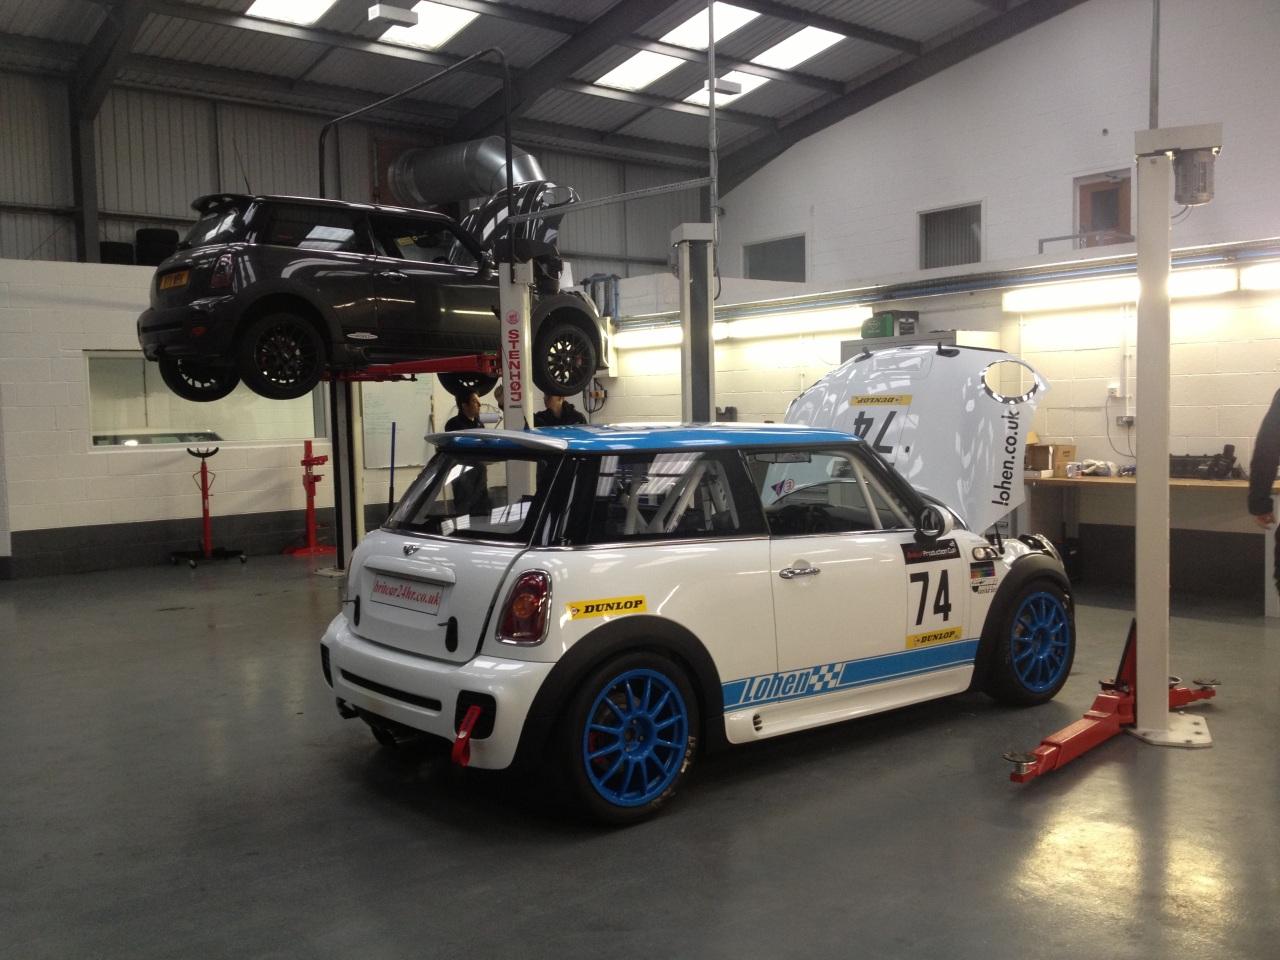 JCW Mods & Lohen's R56 Challenge Racecar Polar Bear